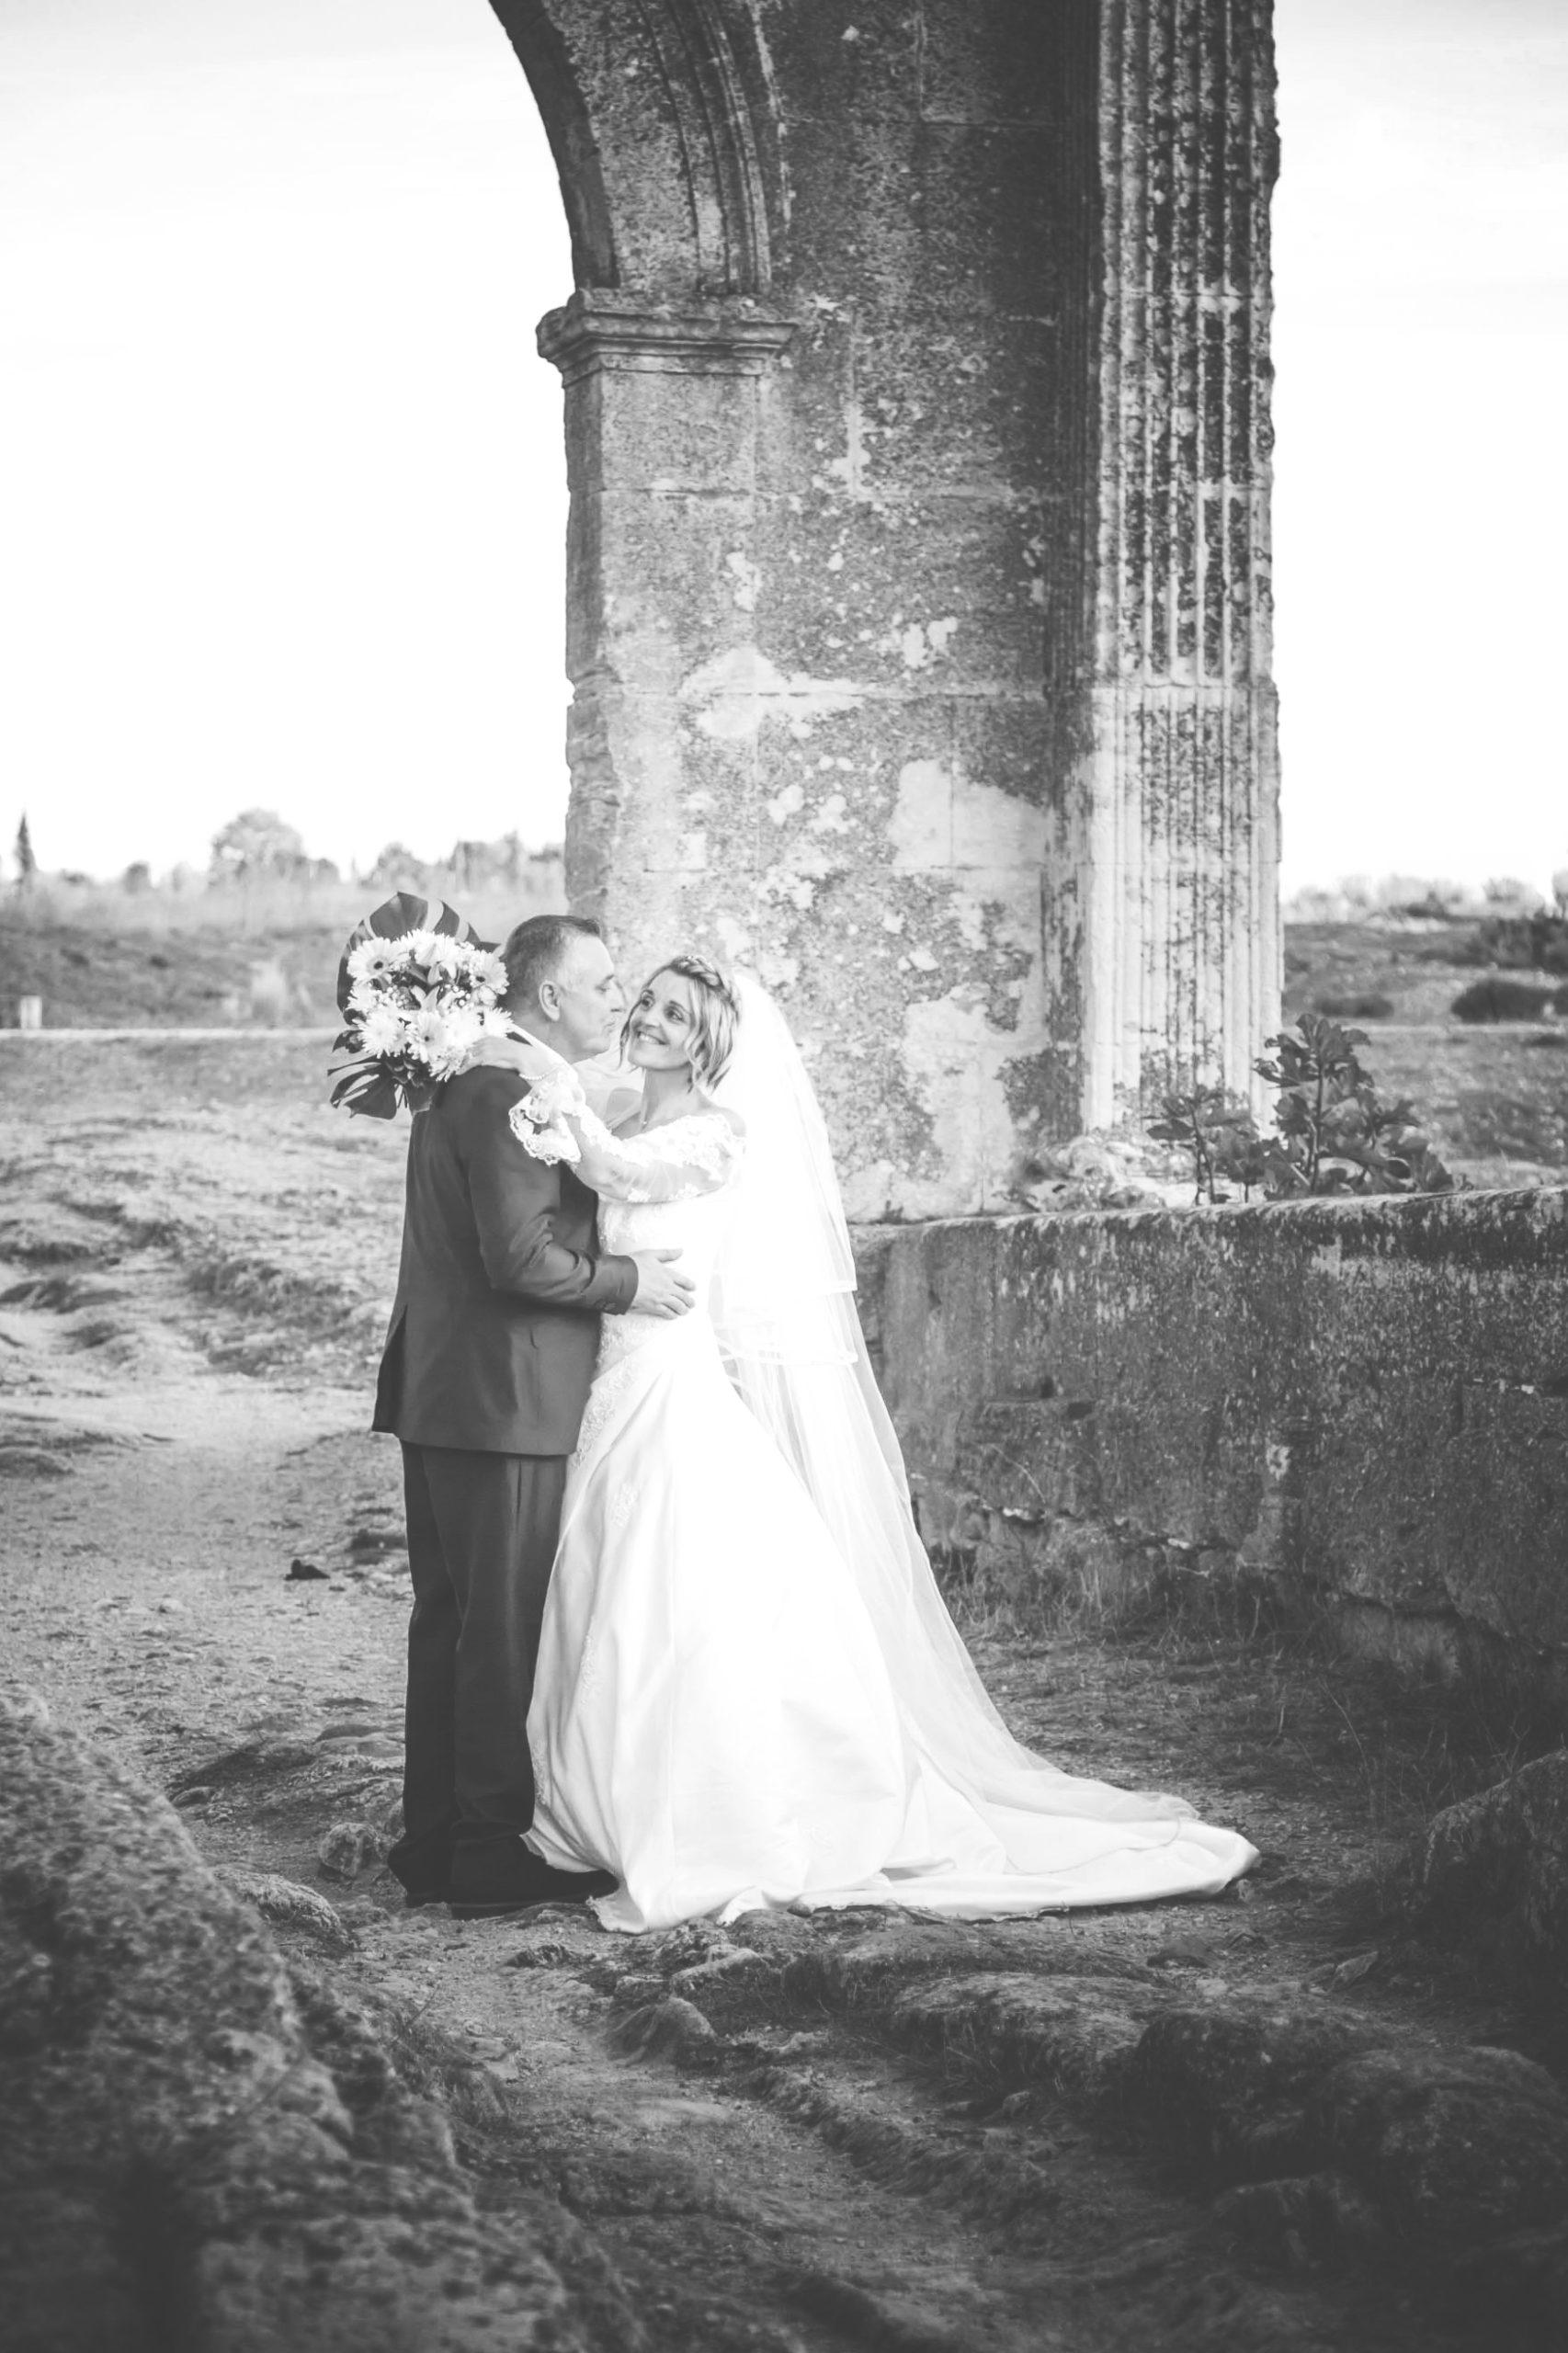 Photographe de mariage, mariage romantique